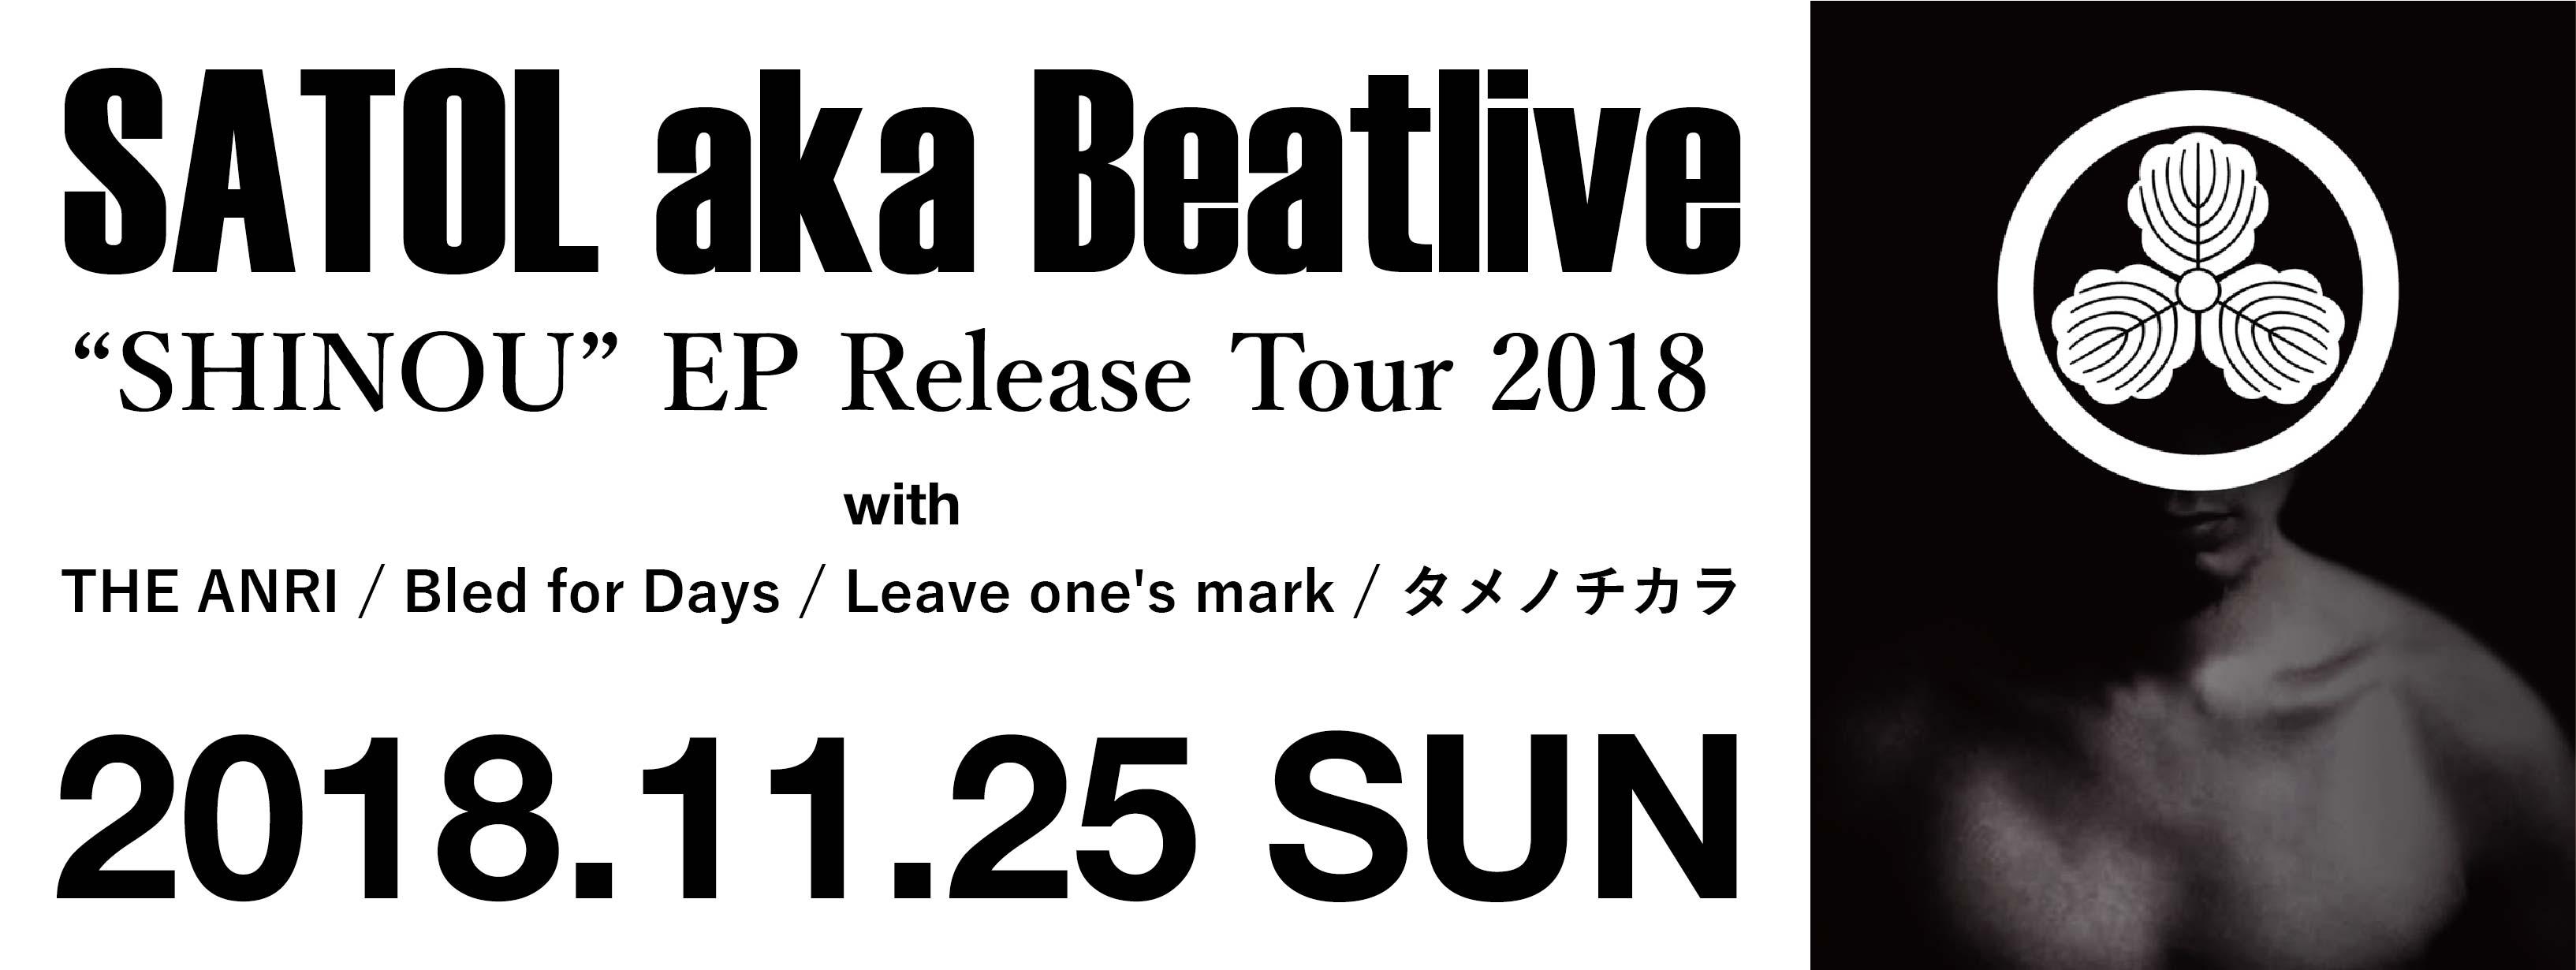 "SATOL aka Beatlive ""SHINOU"" EP Release Tour 2018"